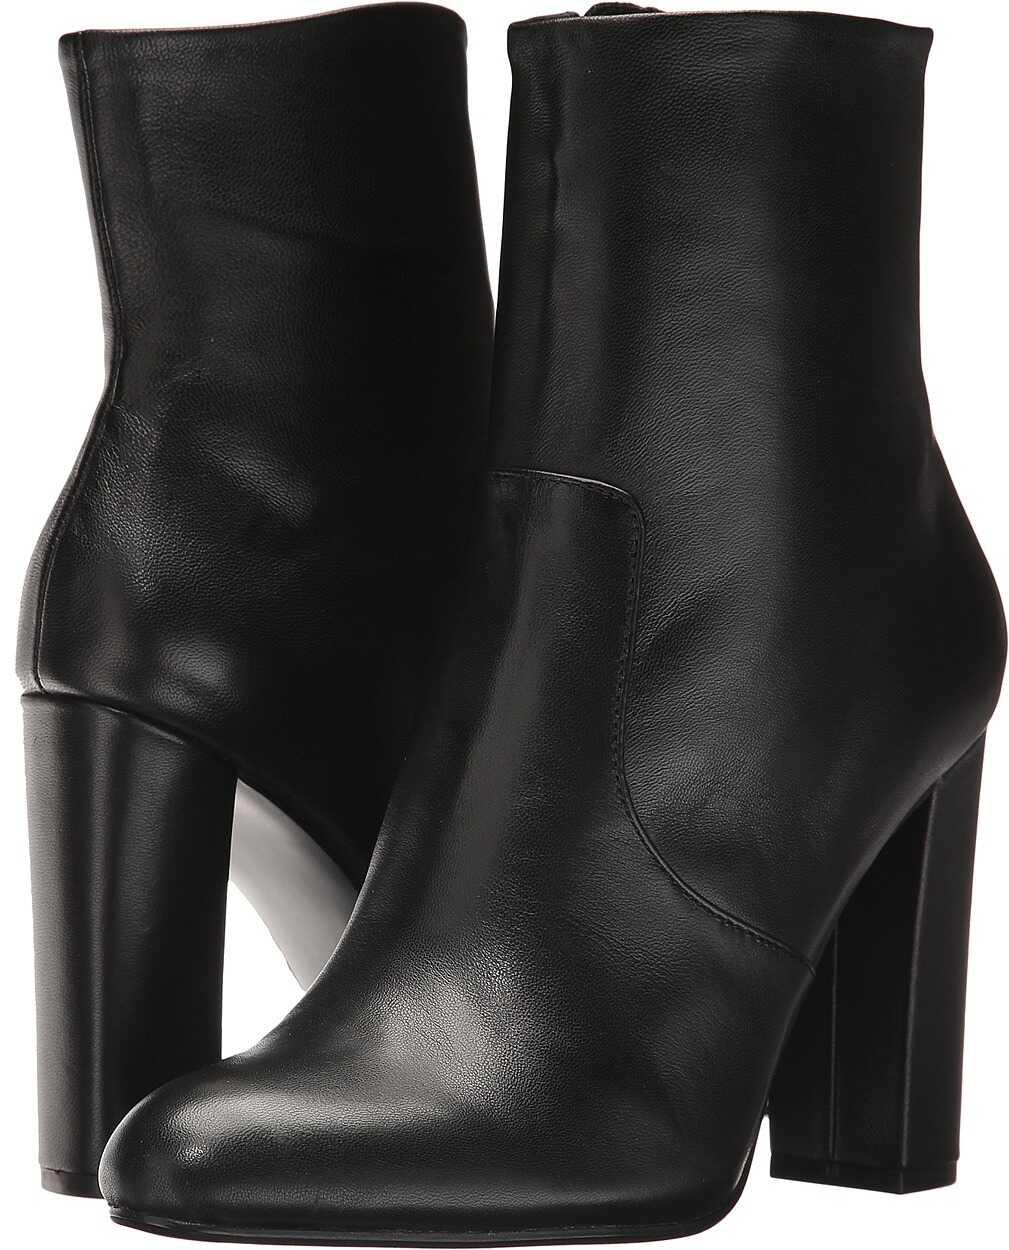 Steve Madden Editor Dress Bootie Black Leather